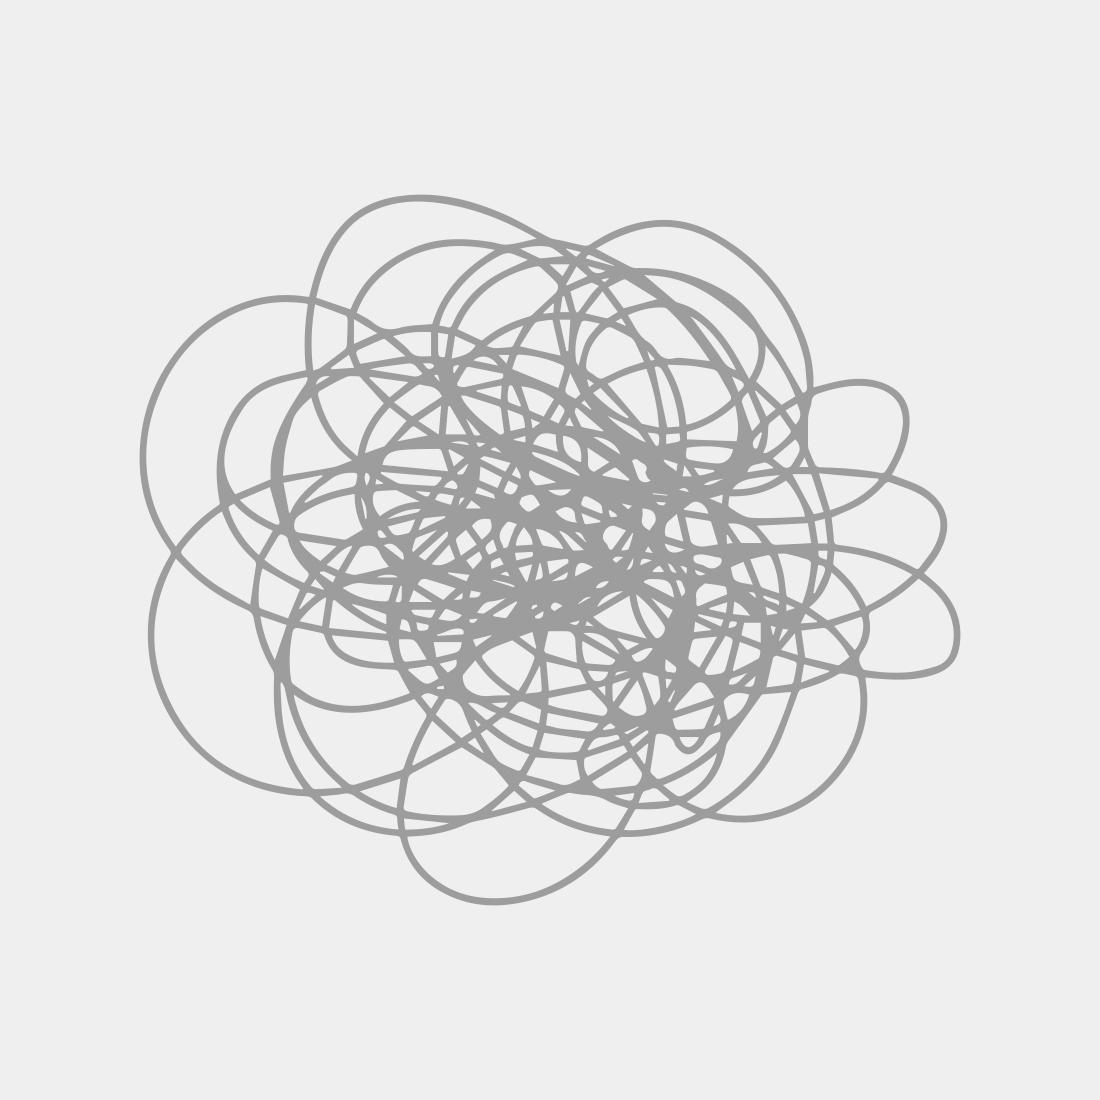 Medium Print Picasso Smoker with Striped Jersey